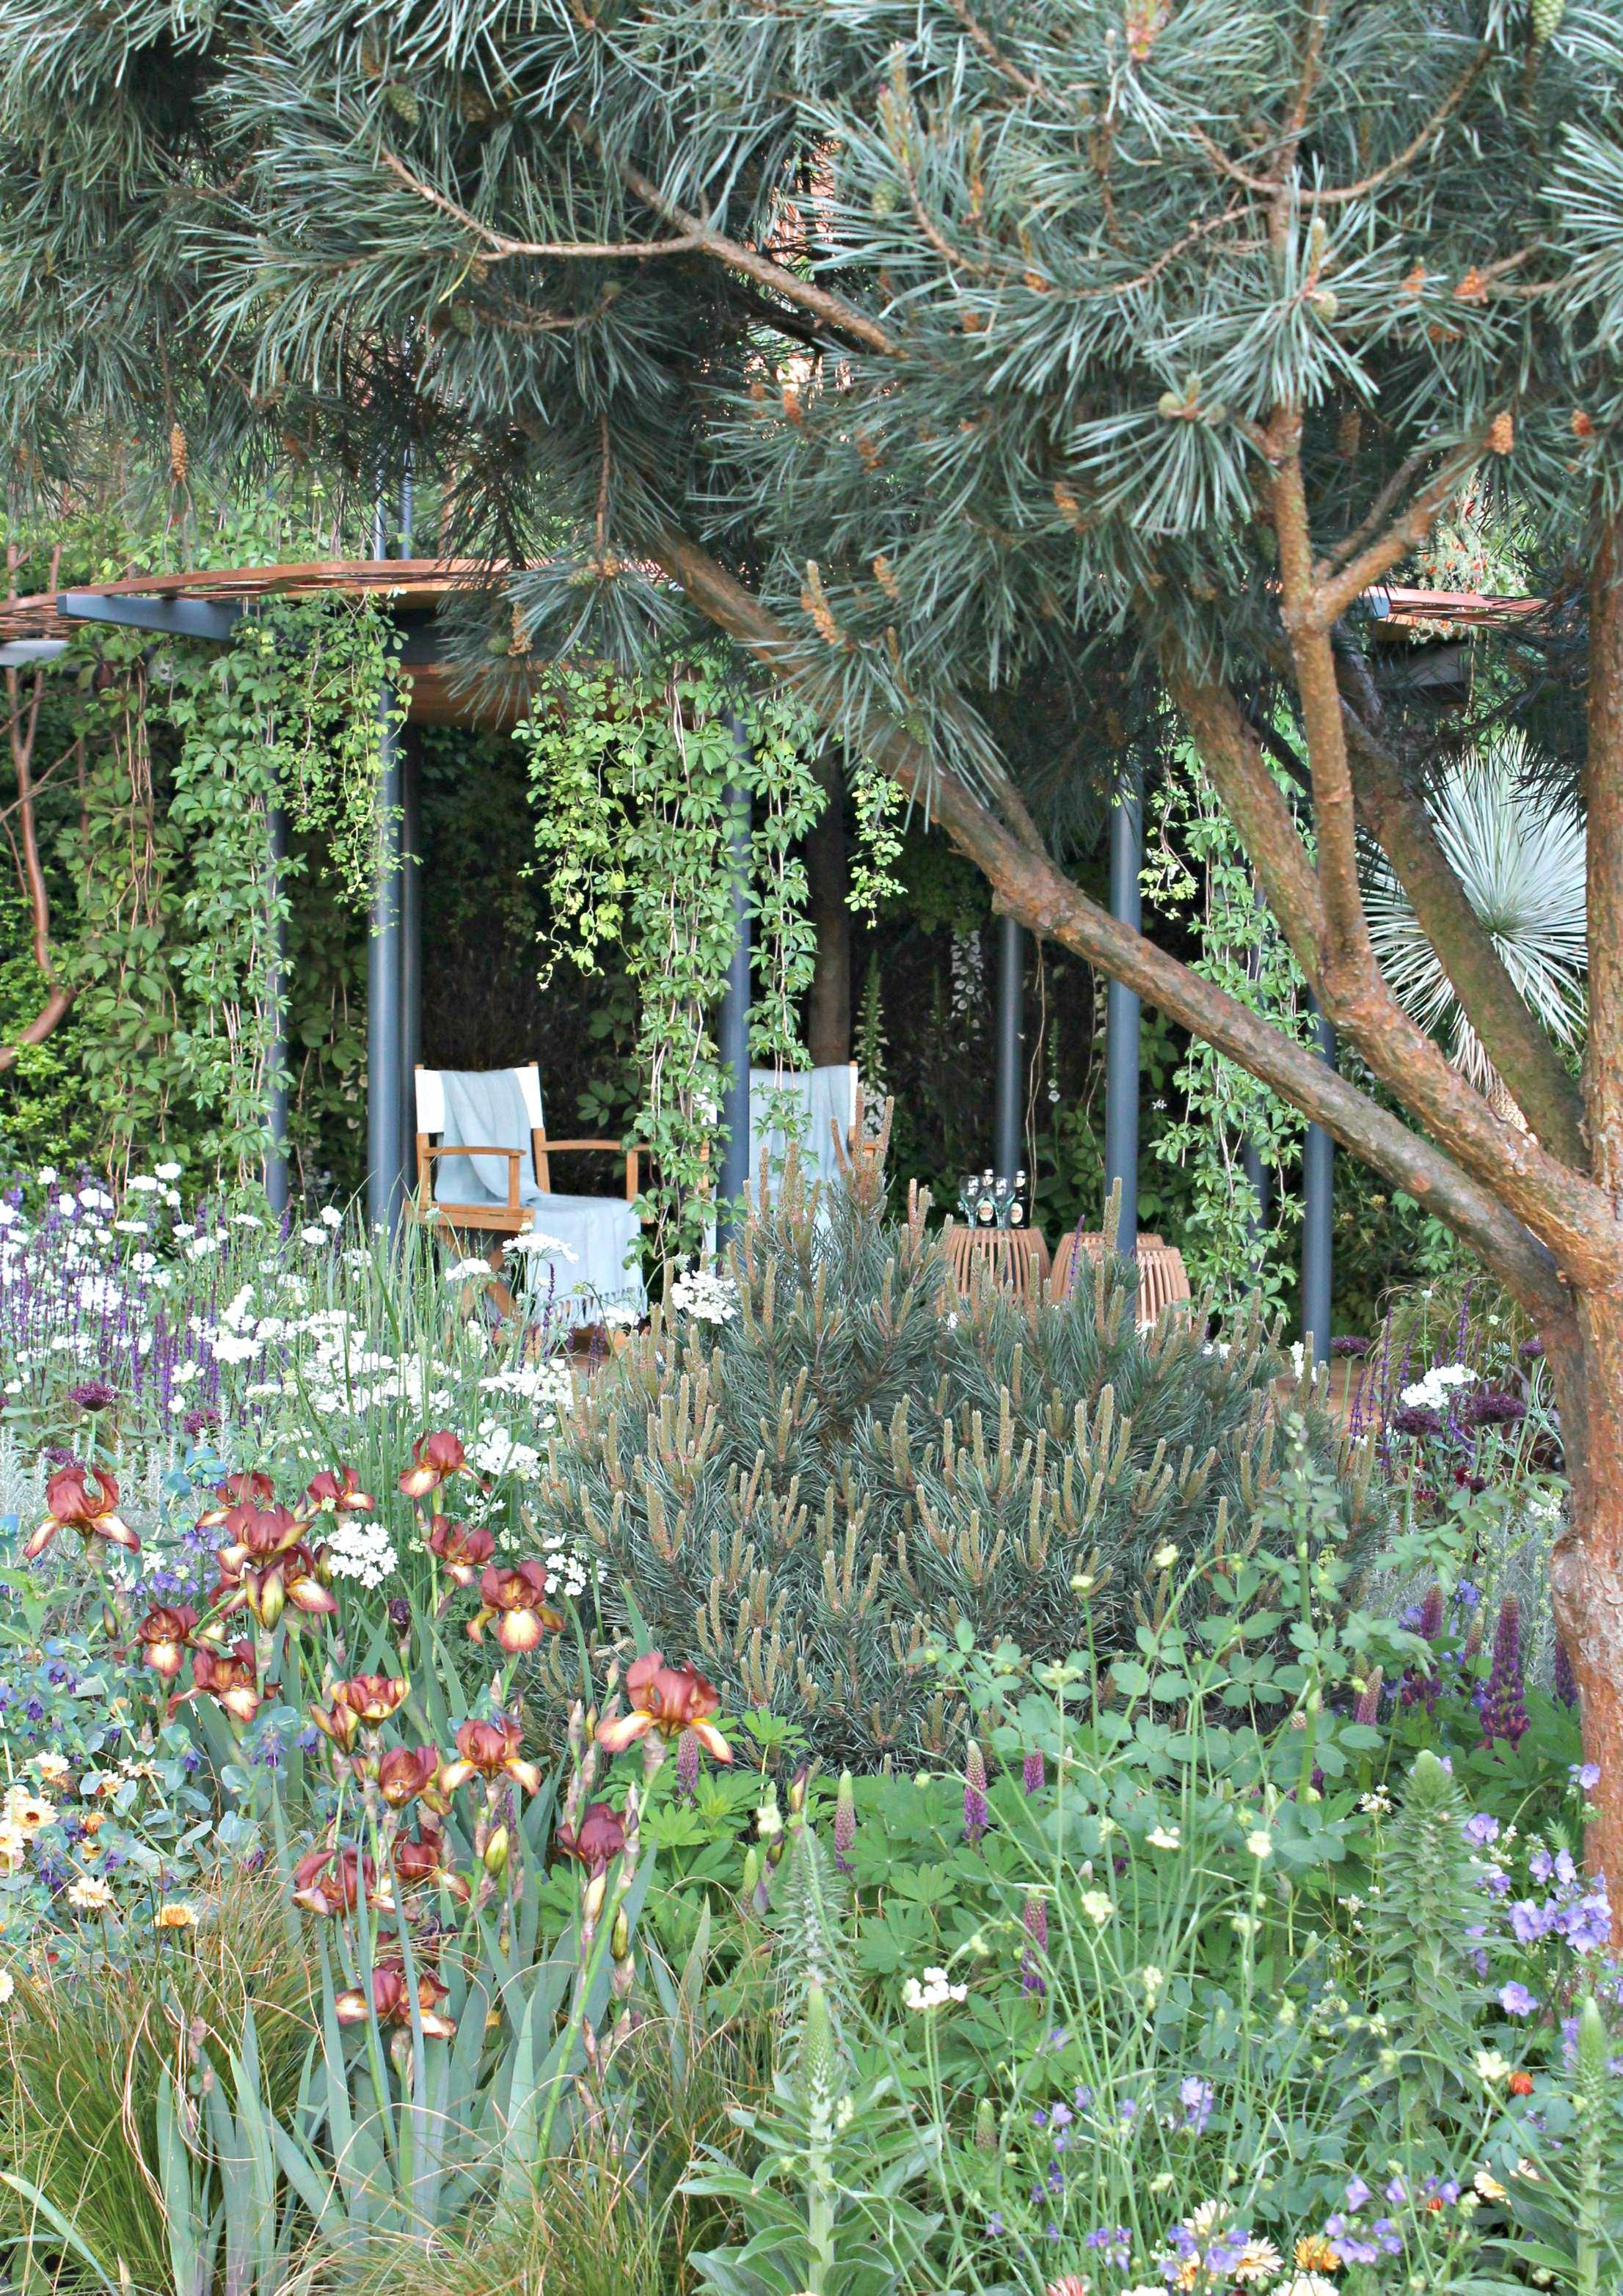 Chelsea-flower-show-garden-photo-by-Geraldine-Tan-of-Little-Big-Bell